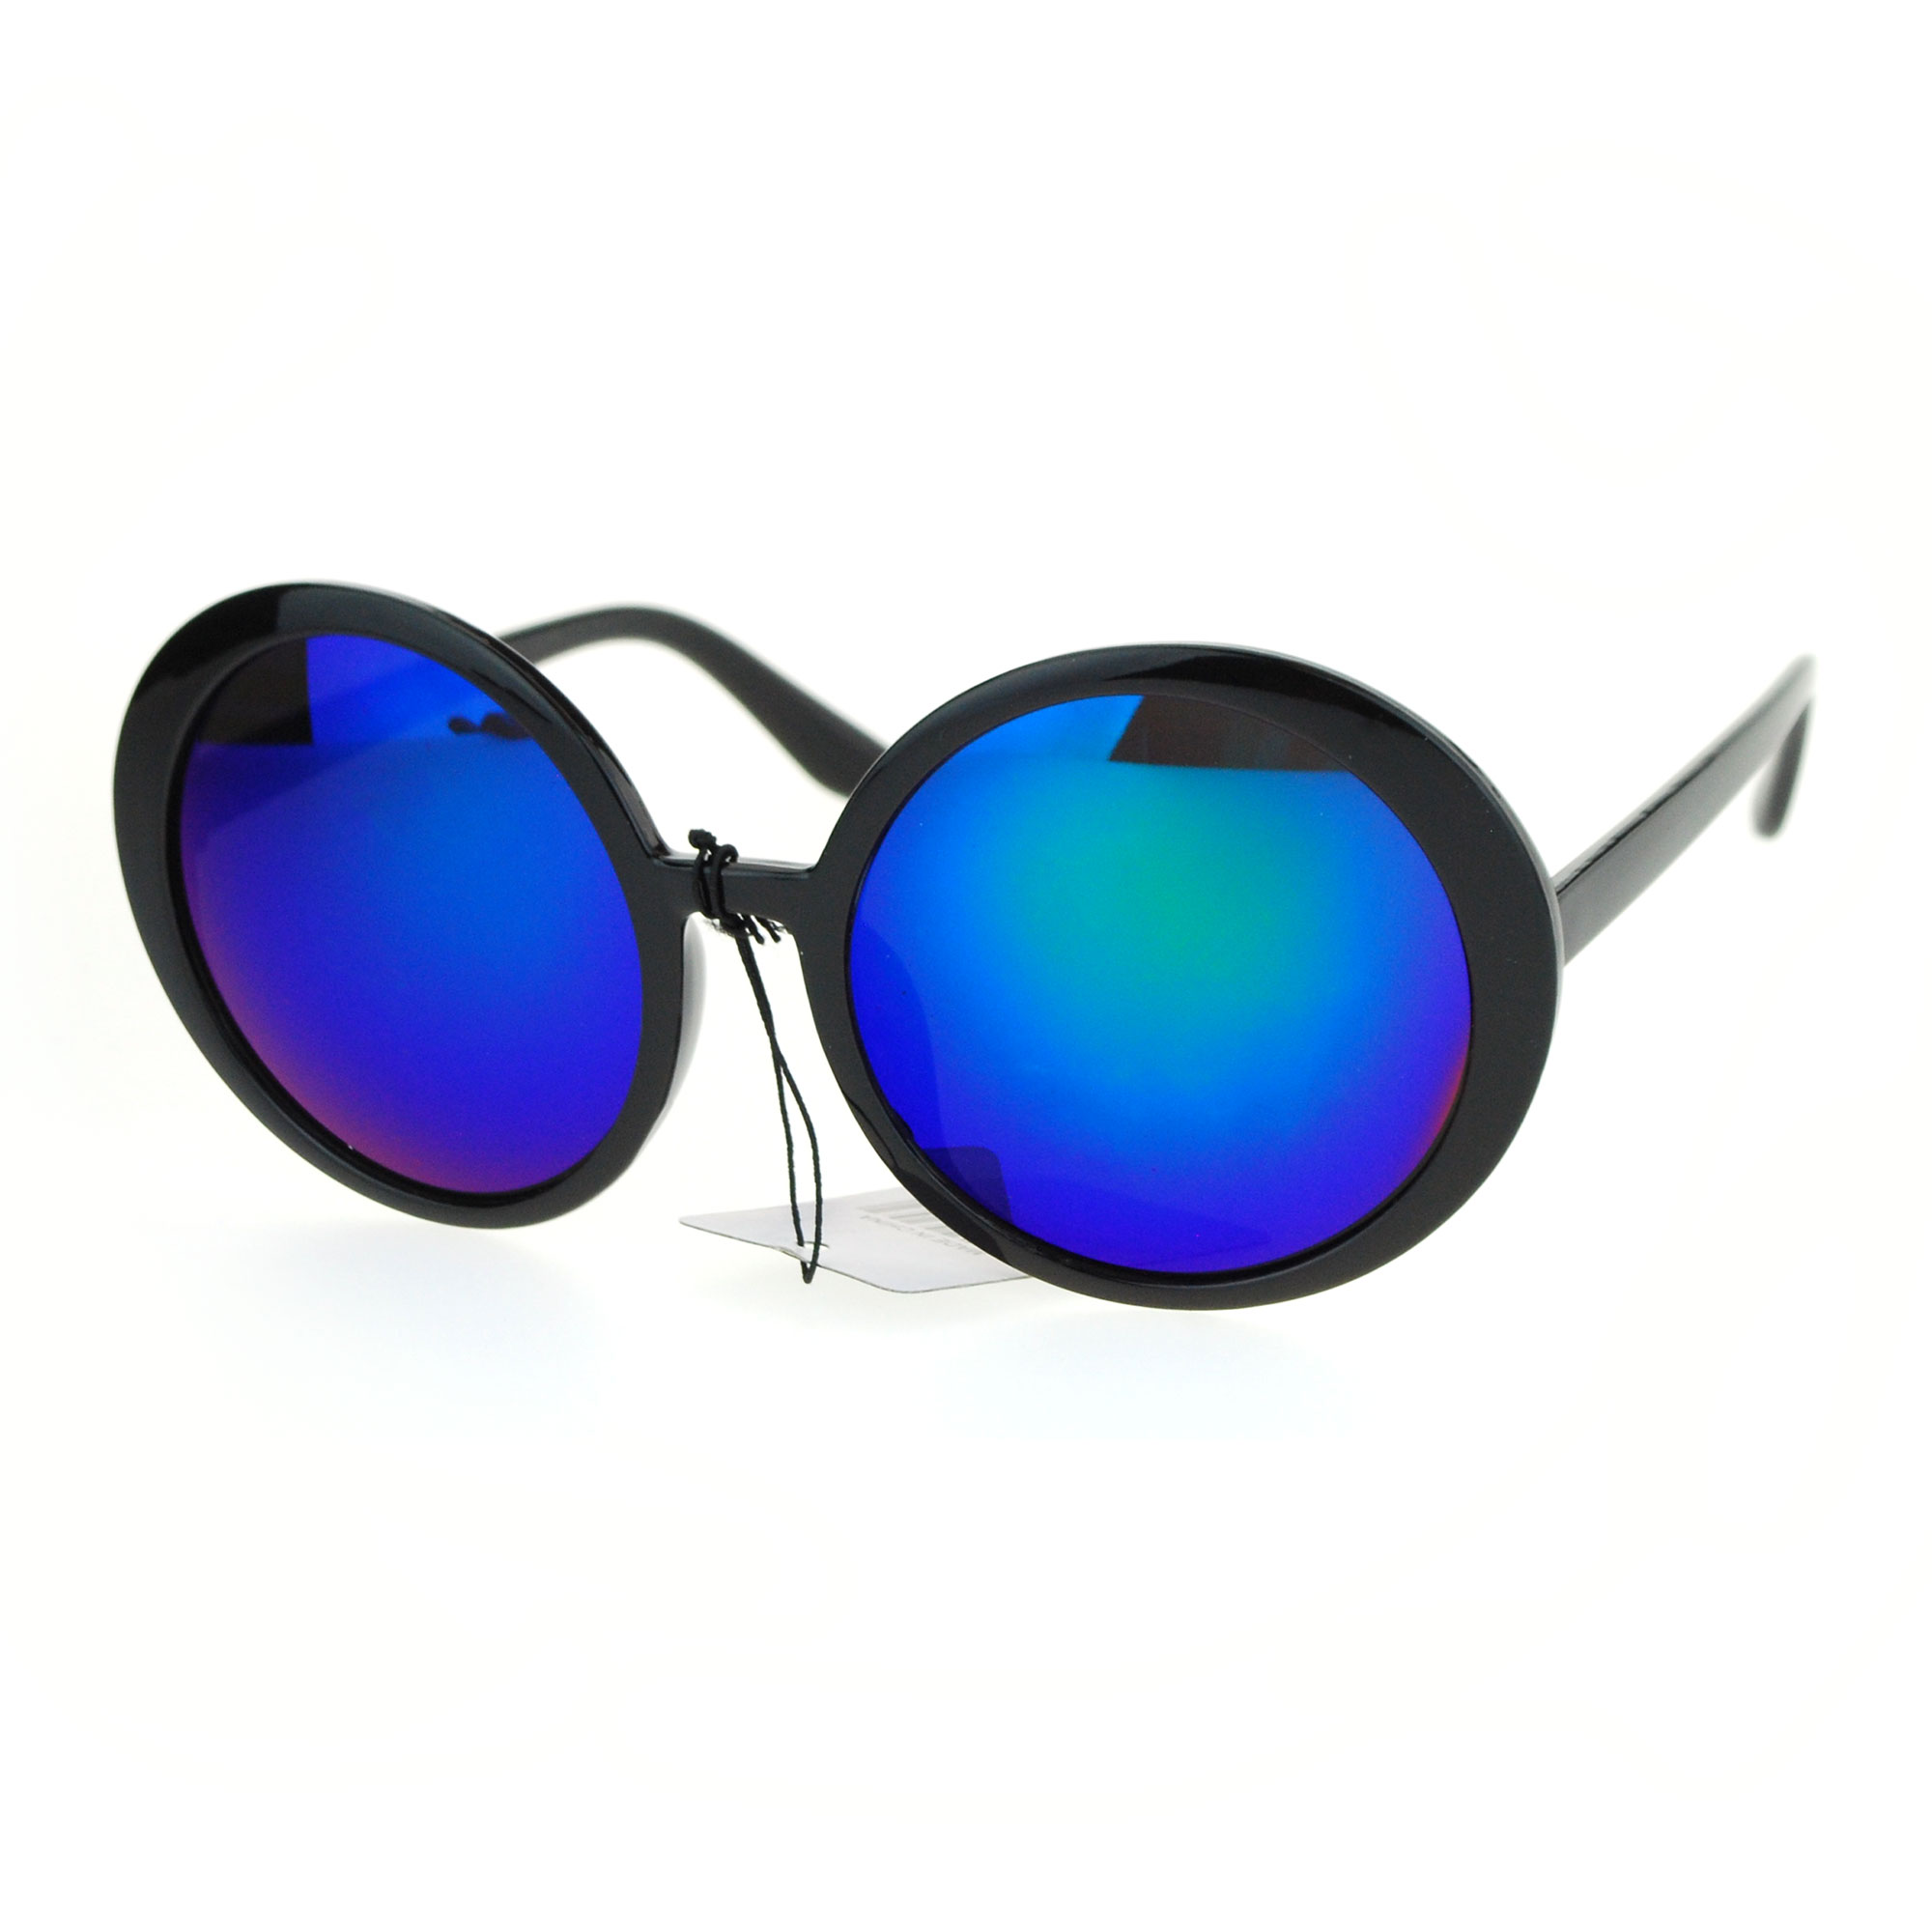 SA106 Mirrored Retro Round Mod Womens Plastic Groove Sunglasses